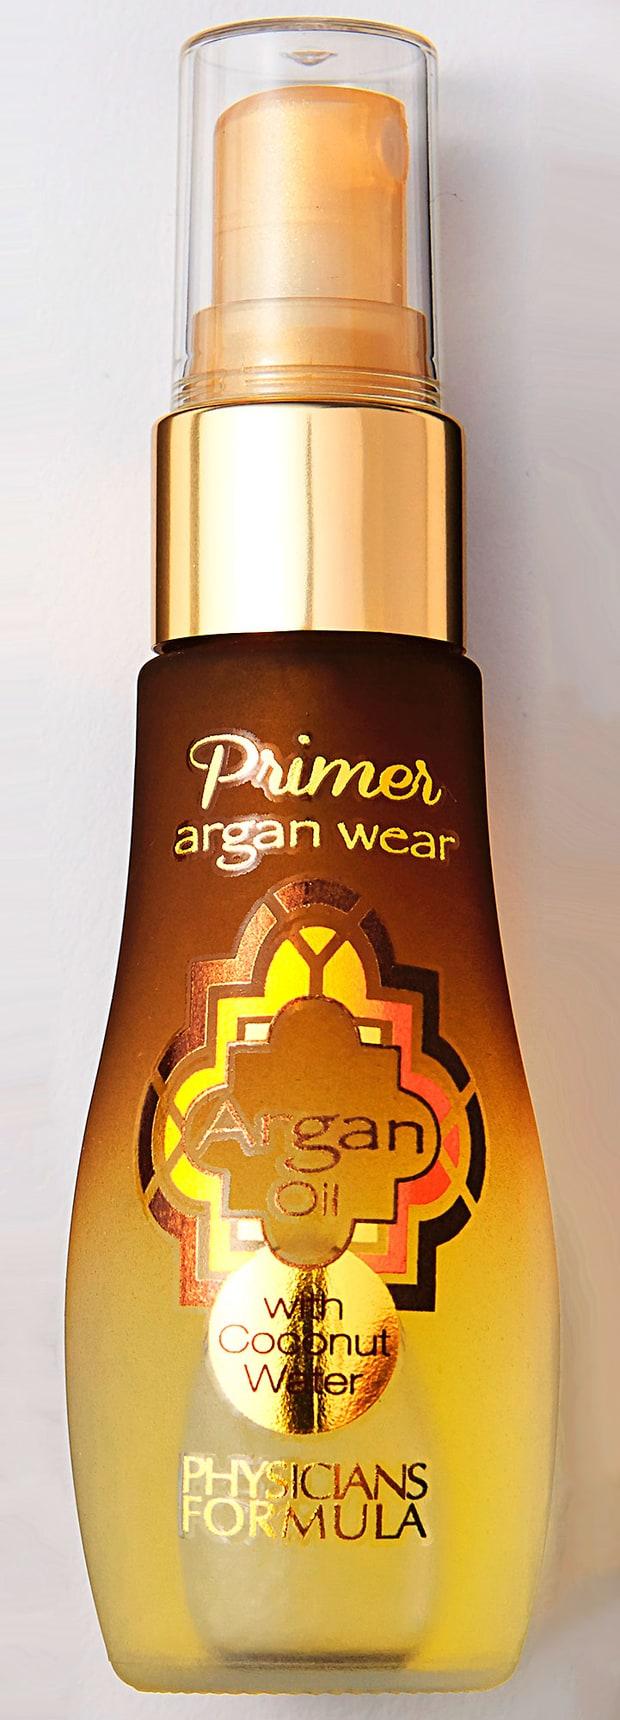 Physicians Formula Argan Oil